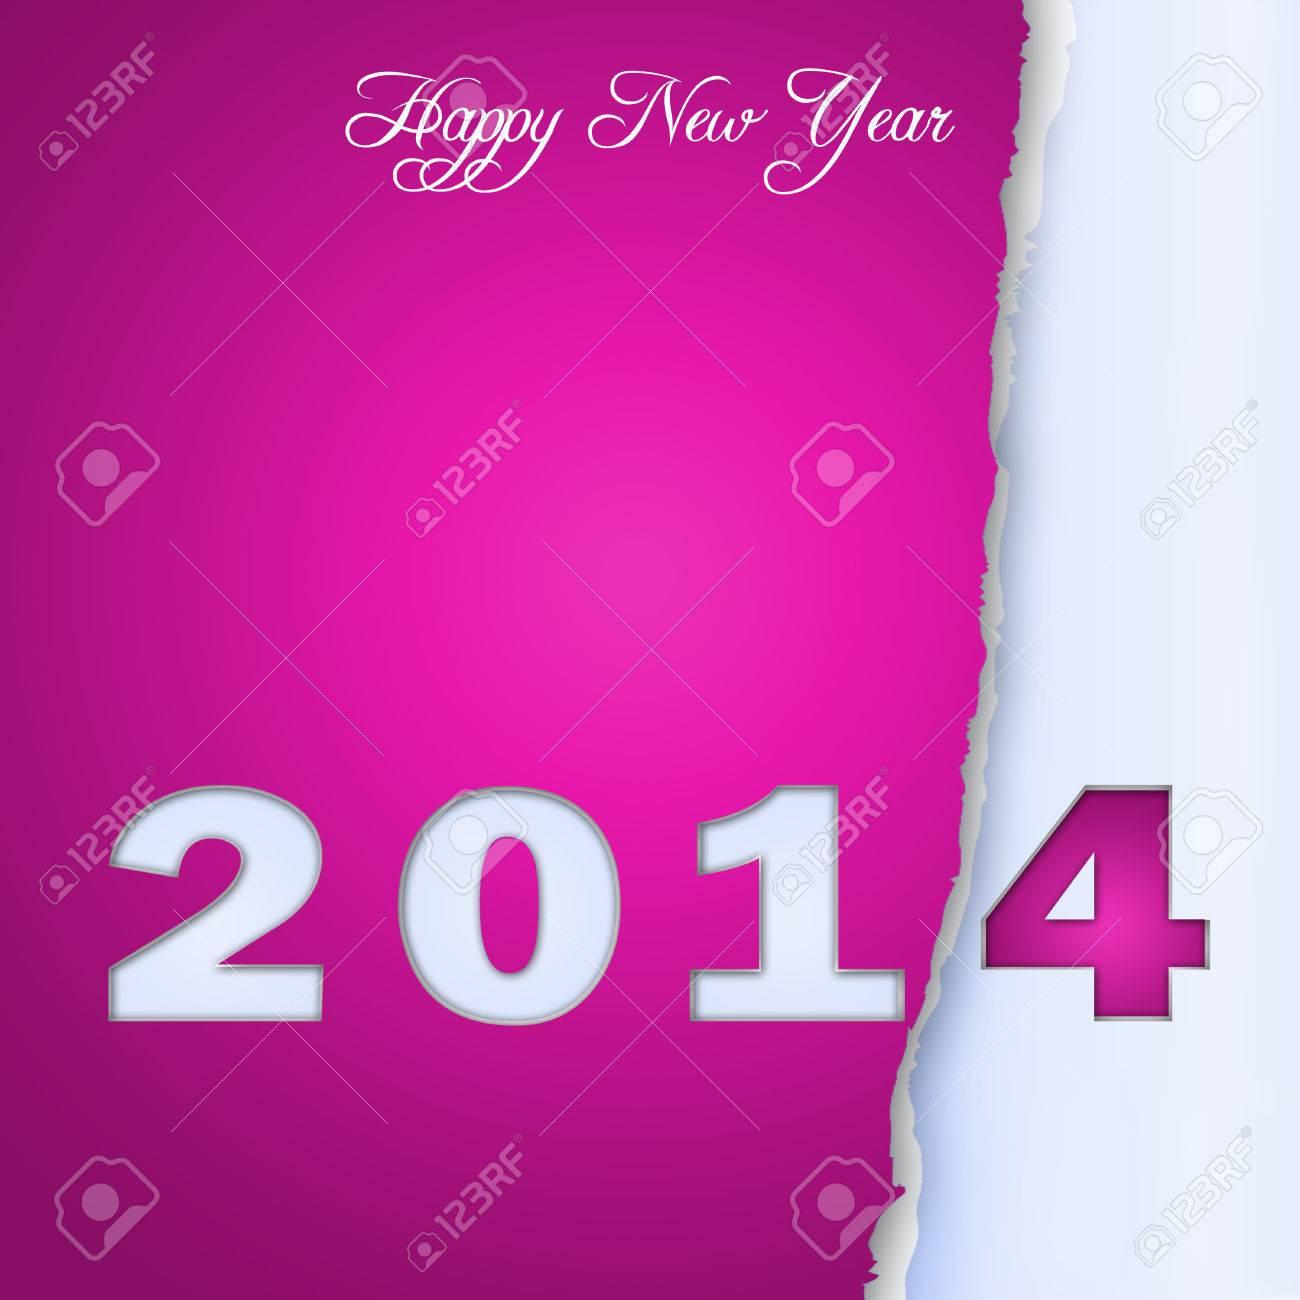 New Year Design On Scraps Of Purple Paper 1 Stock Photo   24206404